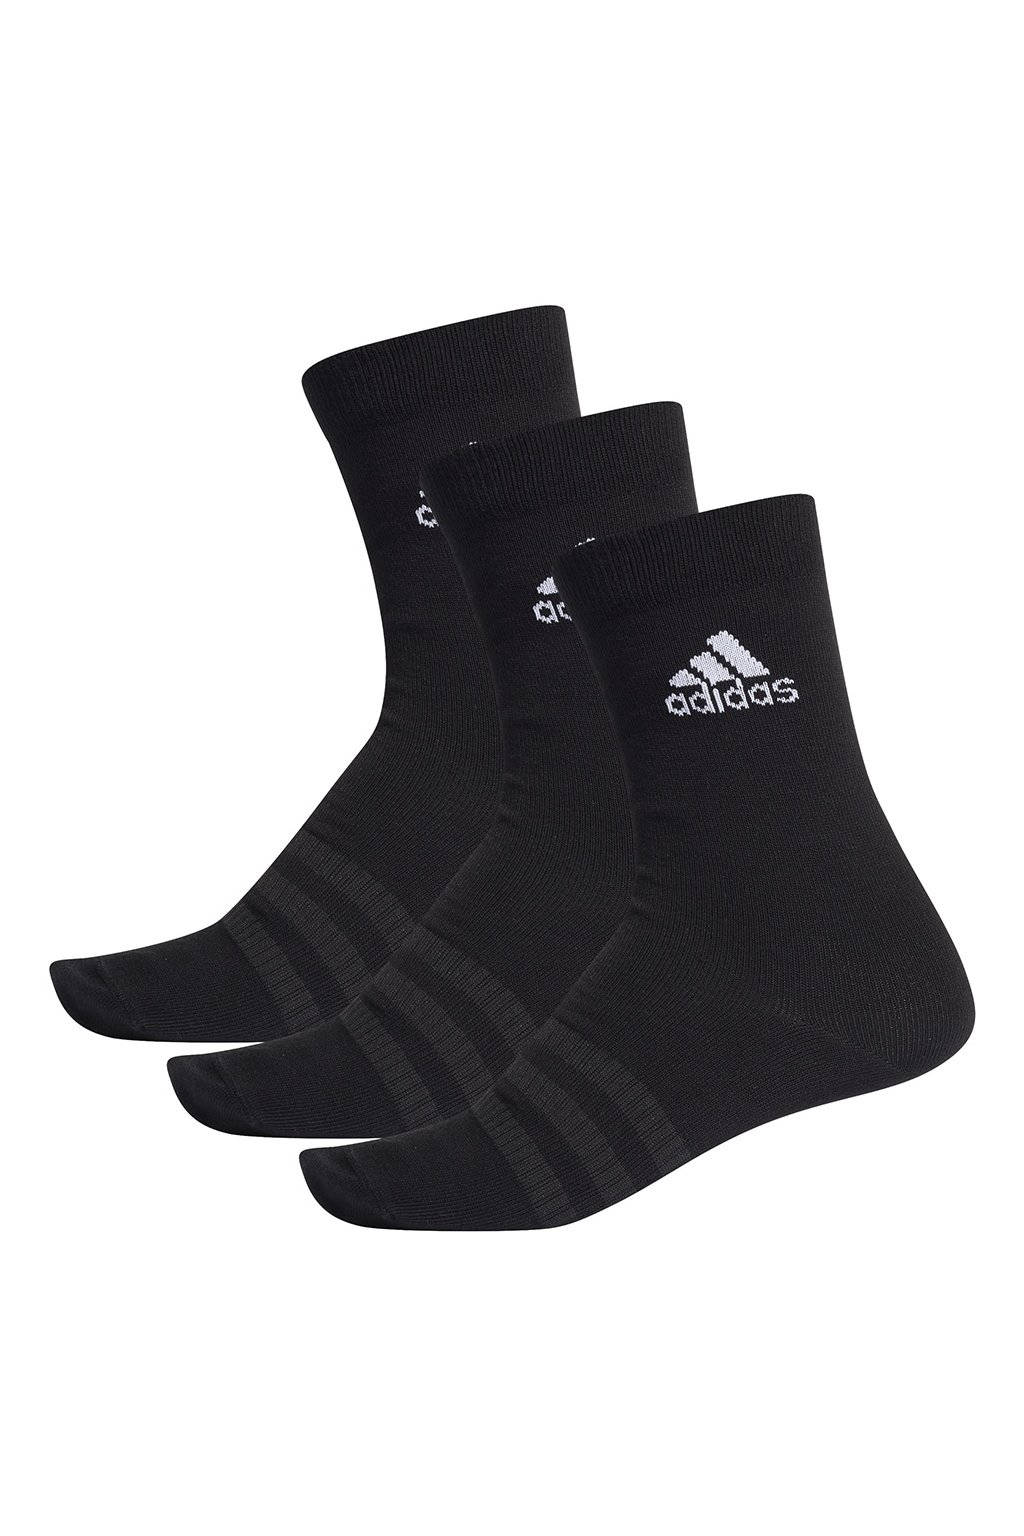 Ponožky adidas Light Crew 3PP čierne DZ9394